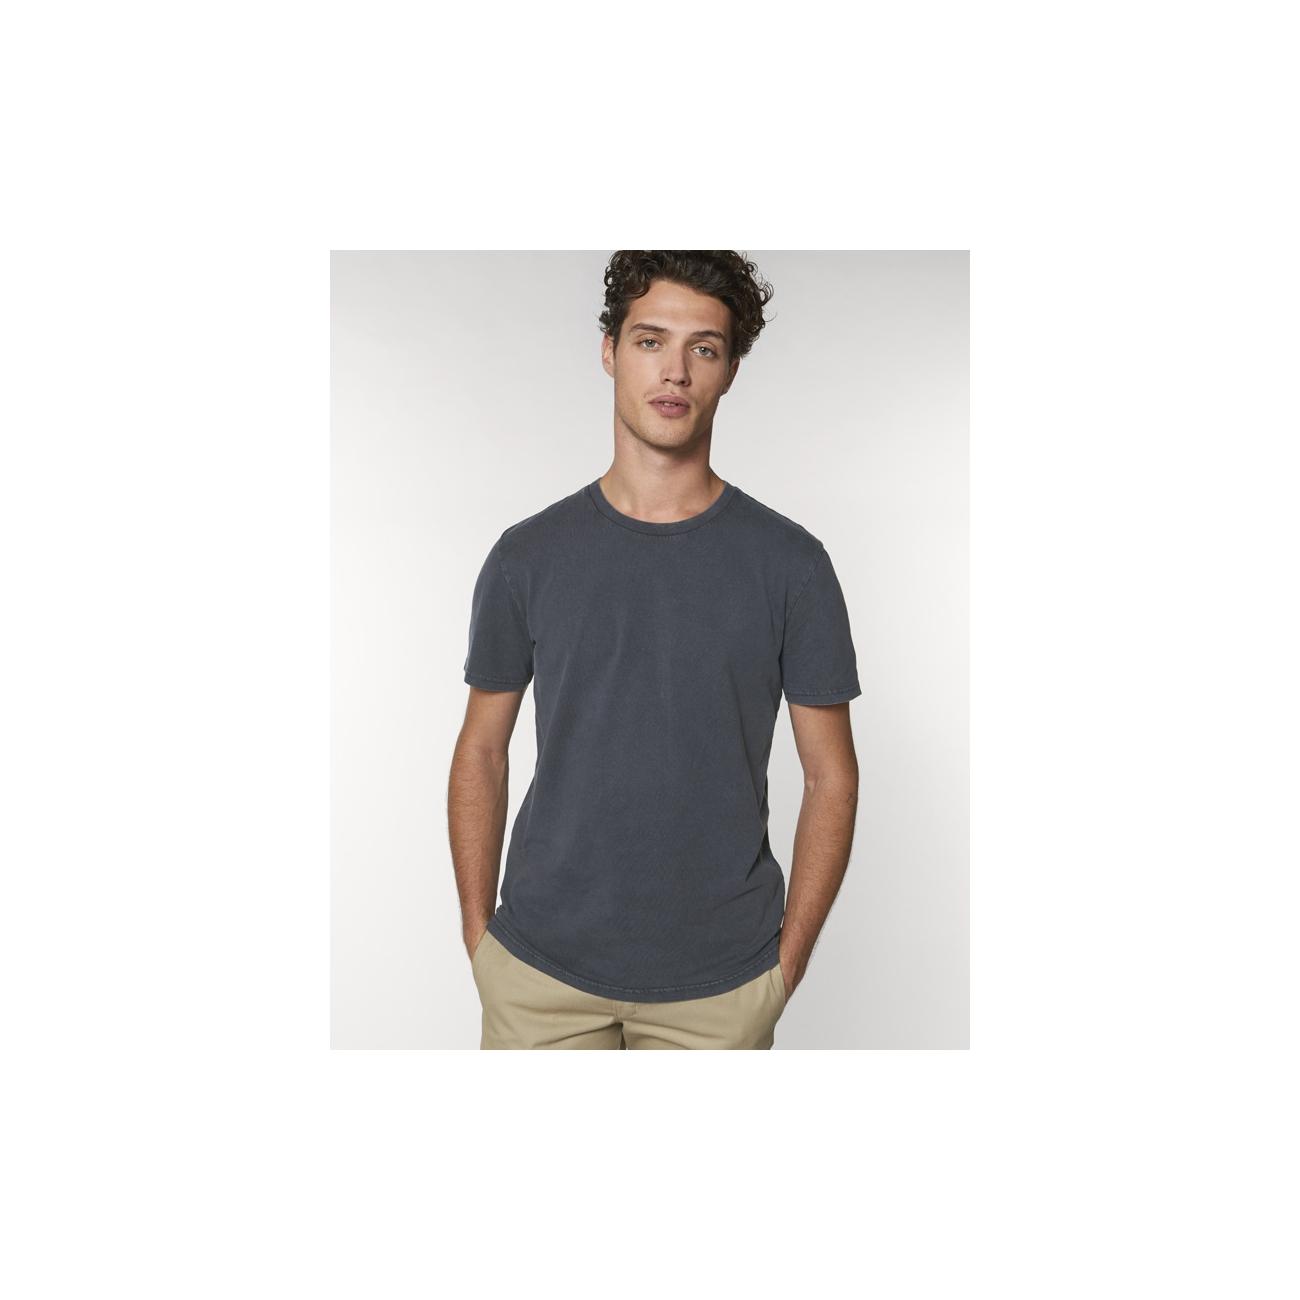 https://tee-shirt-bio.com/9704-thickbox_default/tee-shirt-coton-bio-homme-vintage-gris-indien.jpg